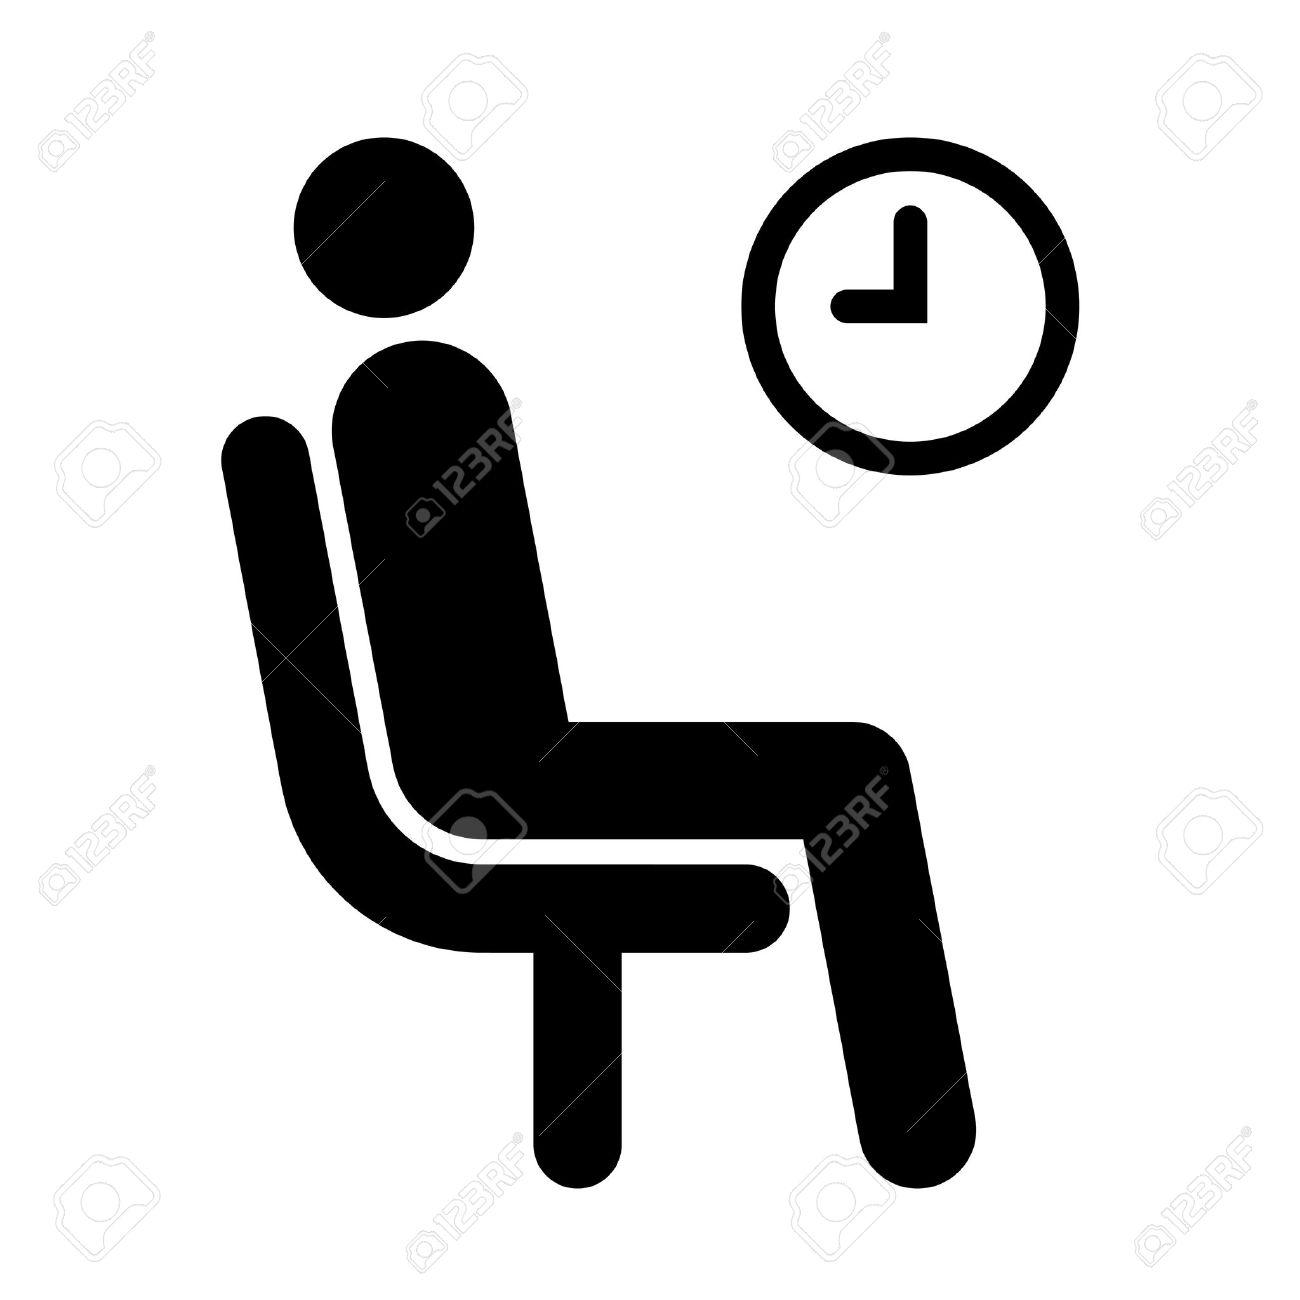 4903 waiting room stock illustrations cliparts and royalty free waiting room symbol isolated on white background buycottarizona Images